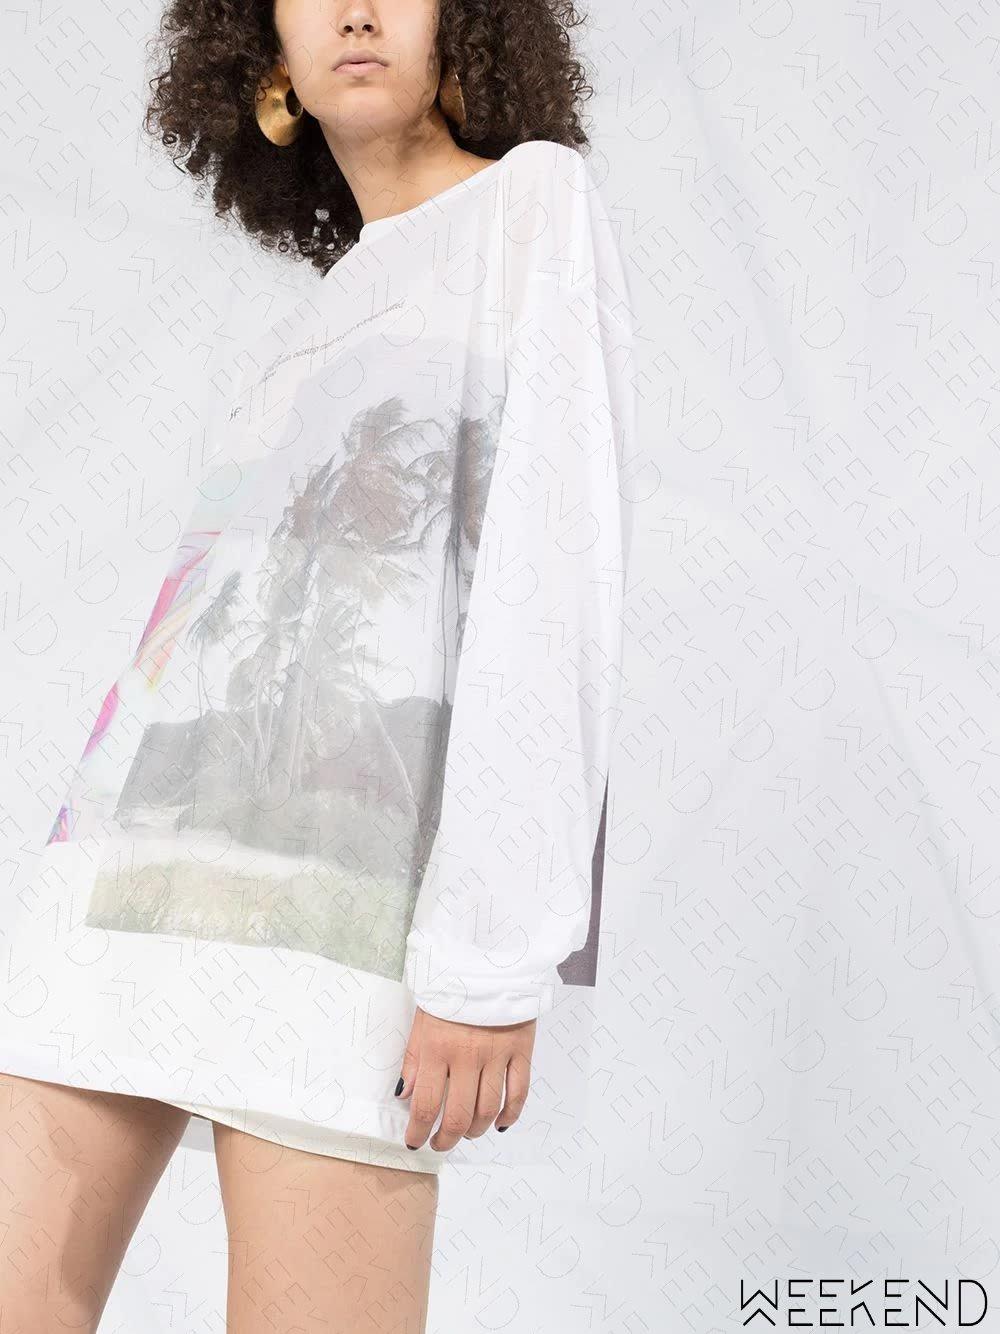 【WEEKEND】 FENTY Immigrant 印圖 寬鬆 長袖 T恤 上衣 白色 可當短洋 蕾哈娜